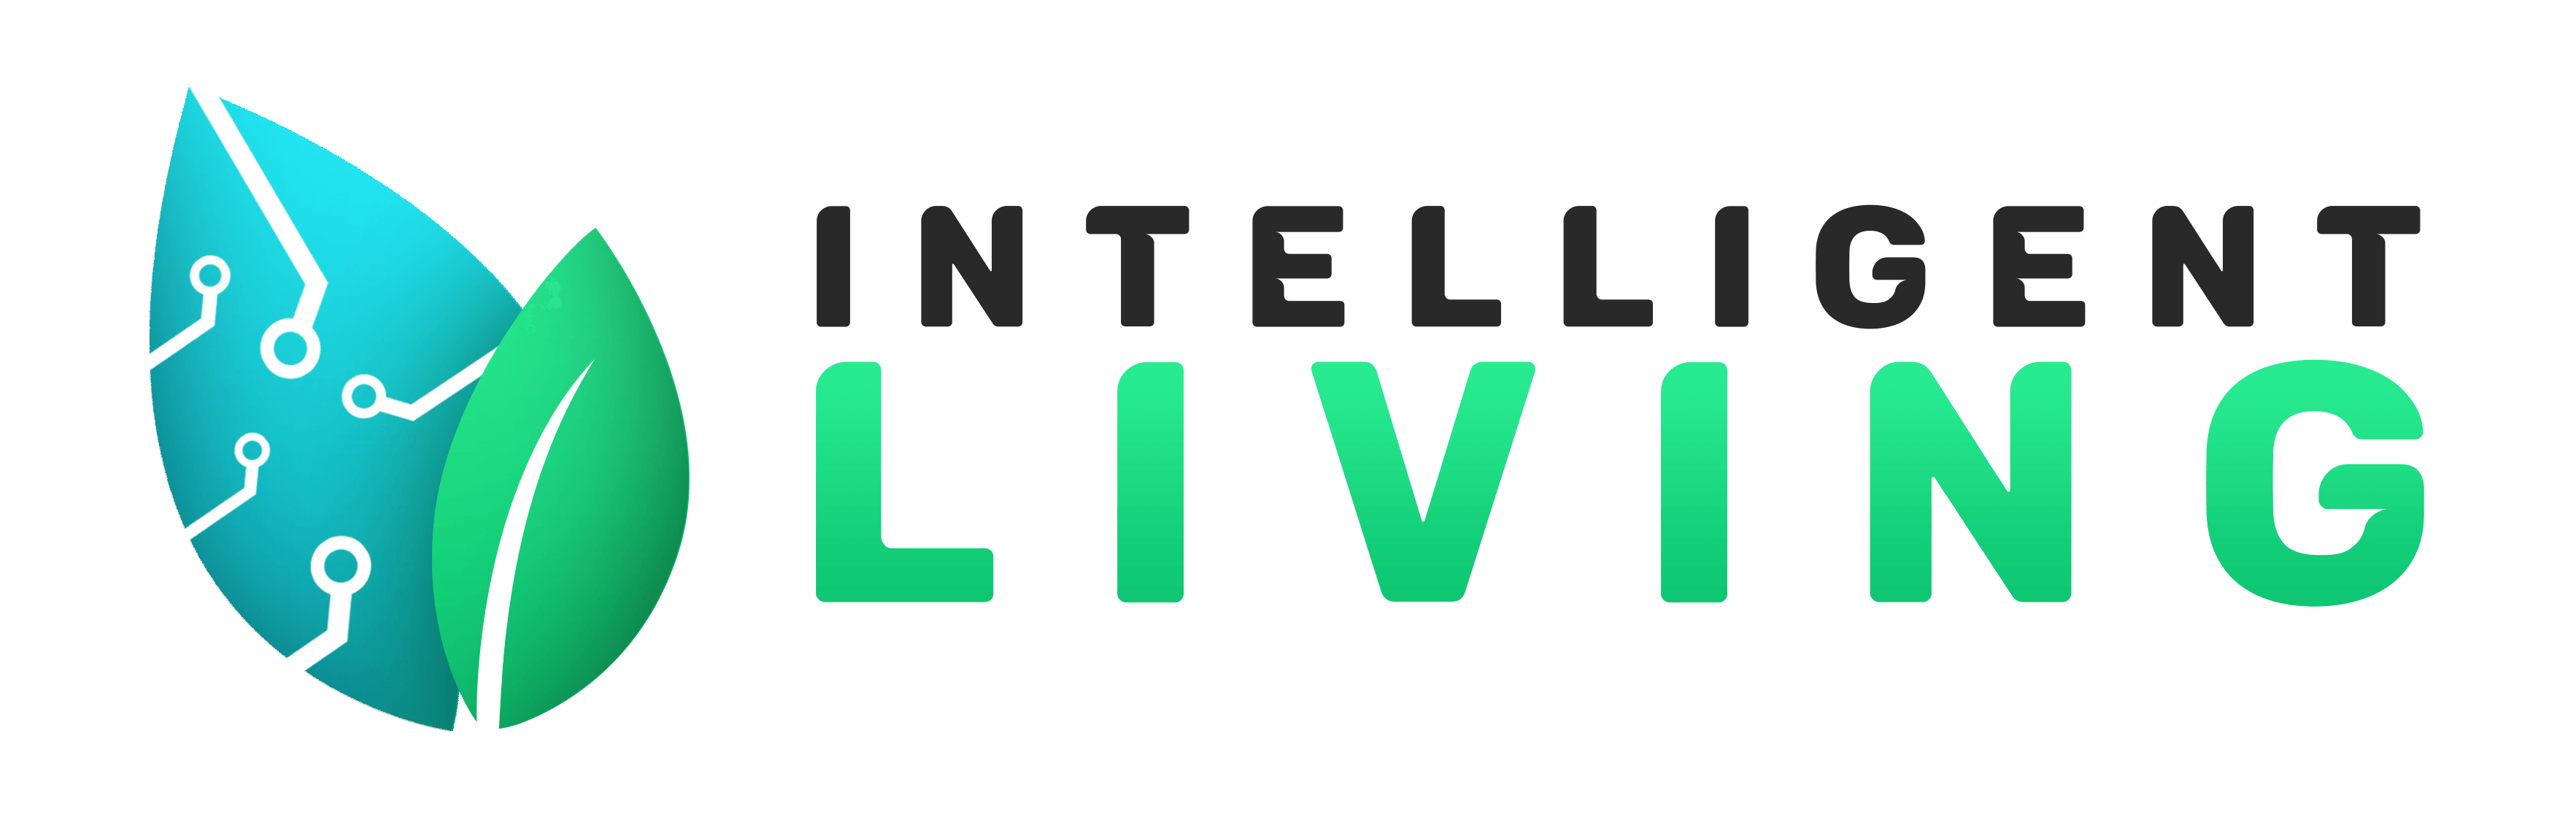 Intelligent living